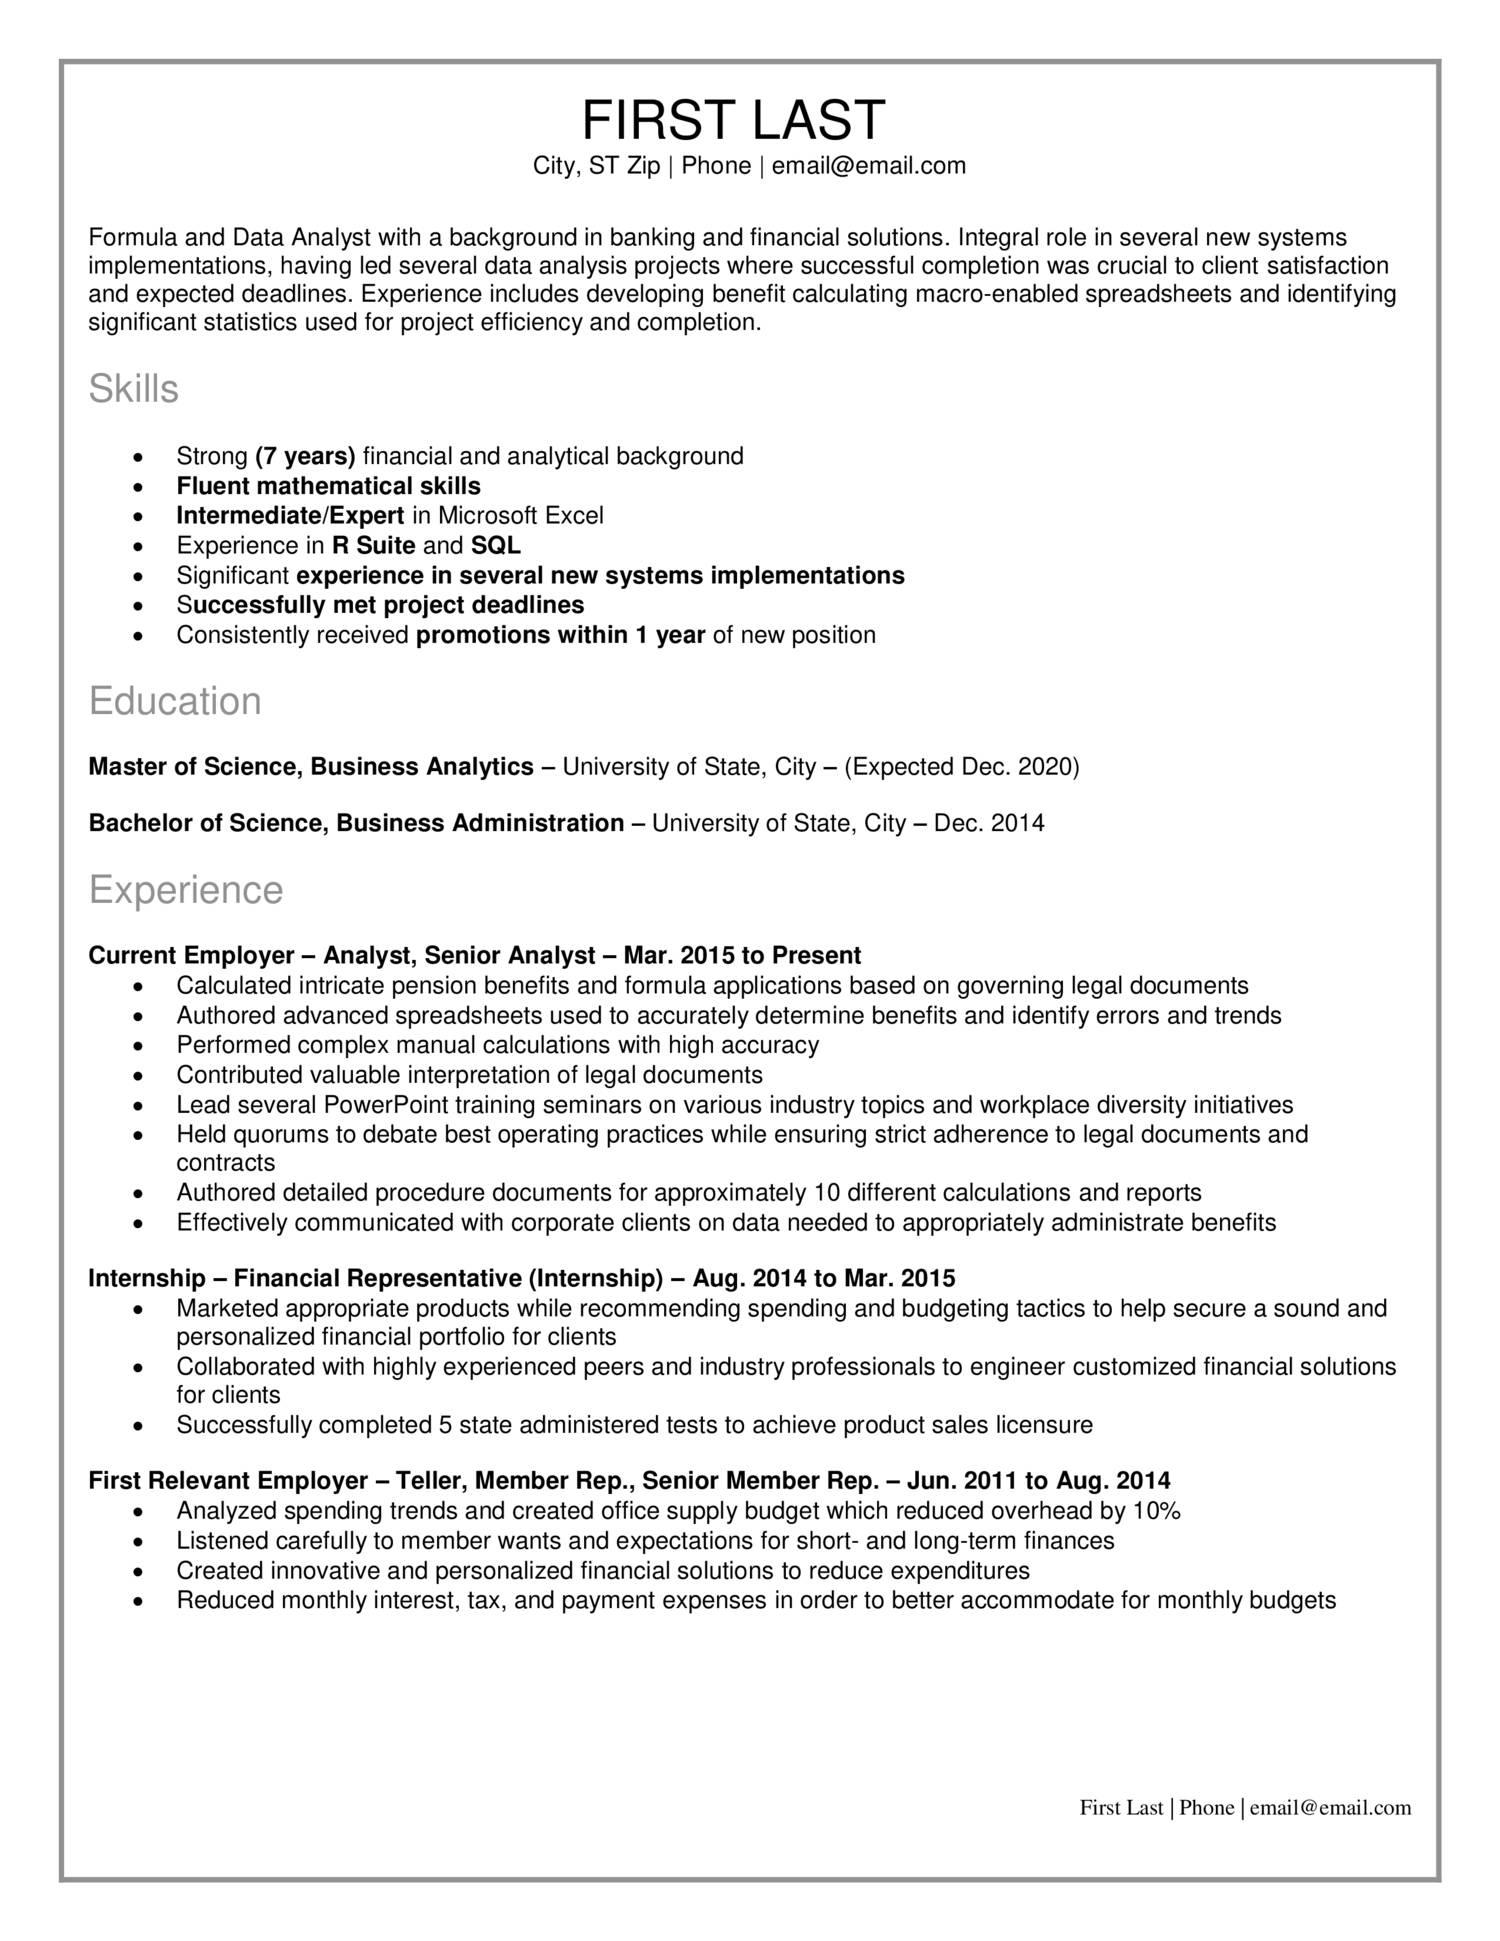 Reddit Resume 2 pdf | DocDroid